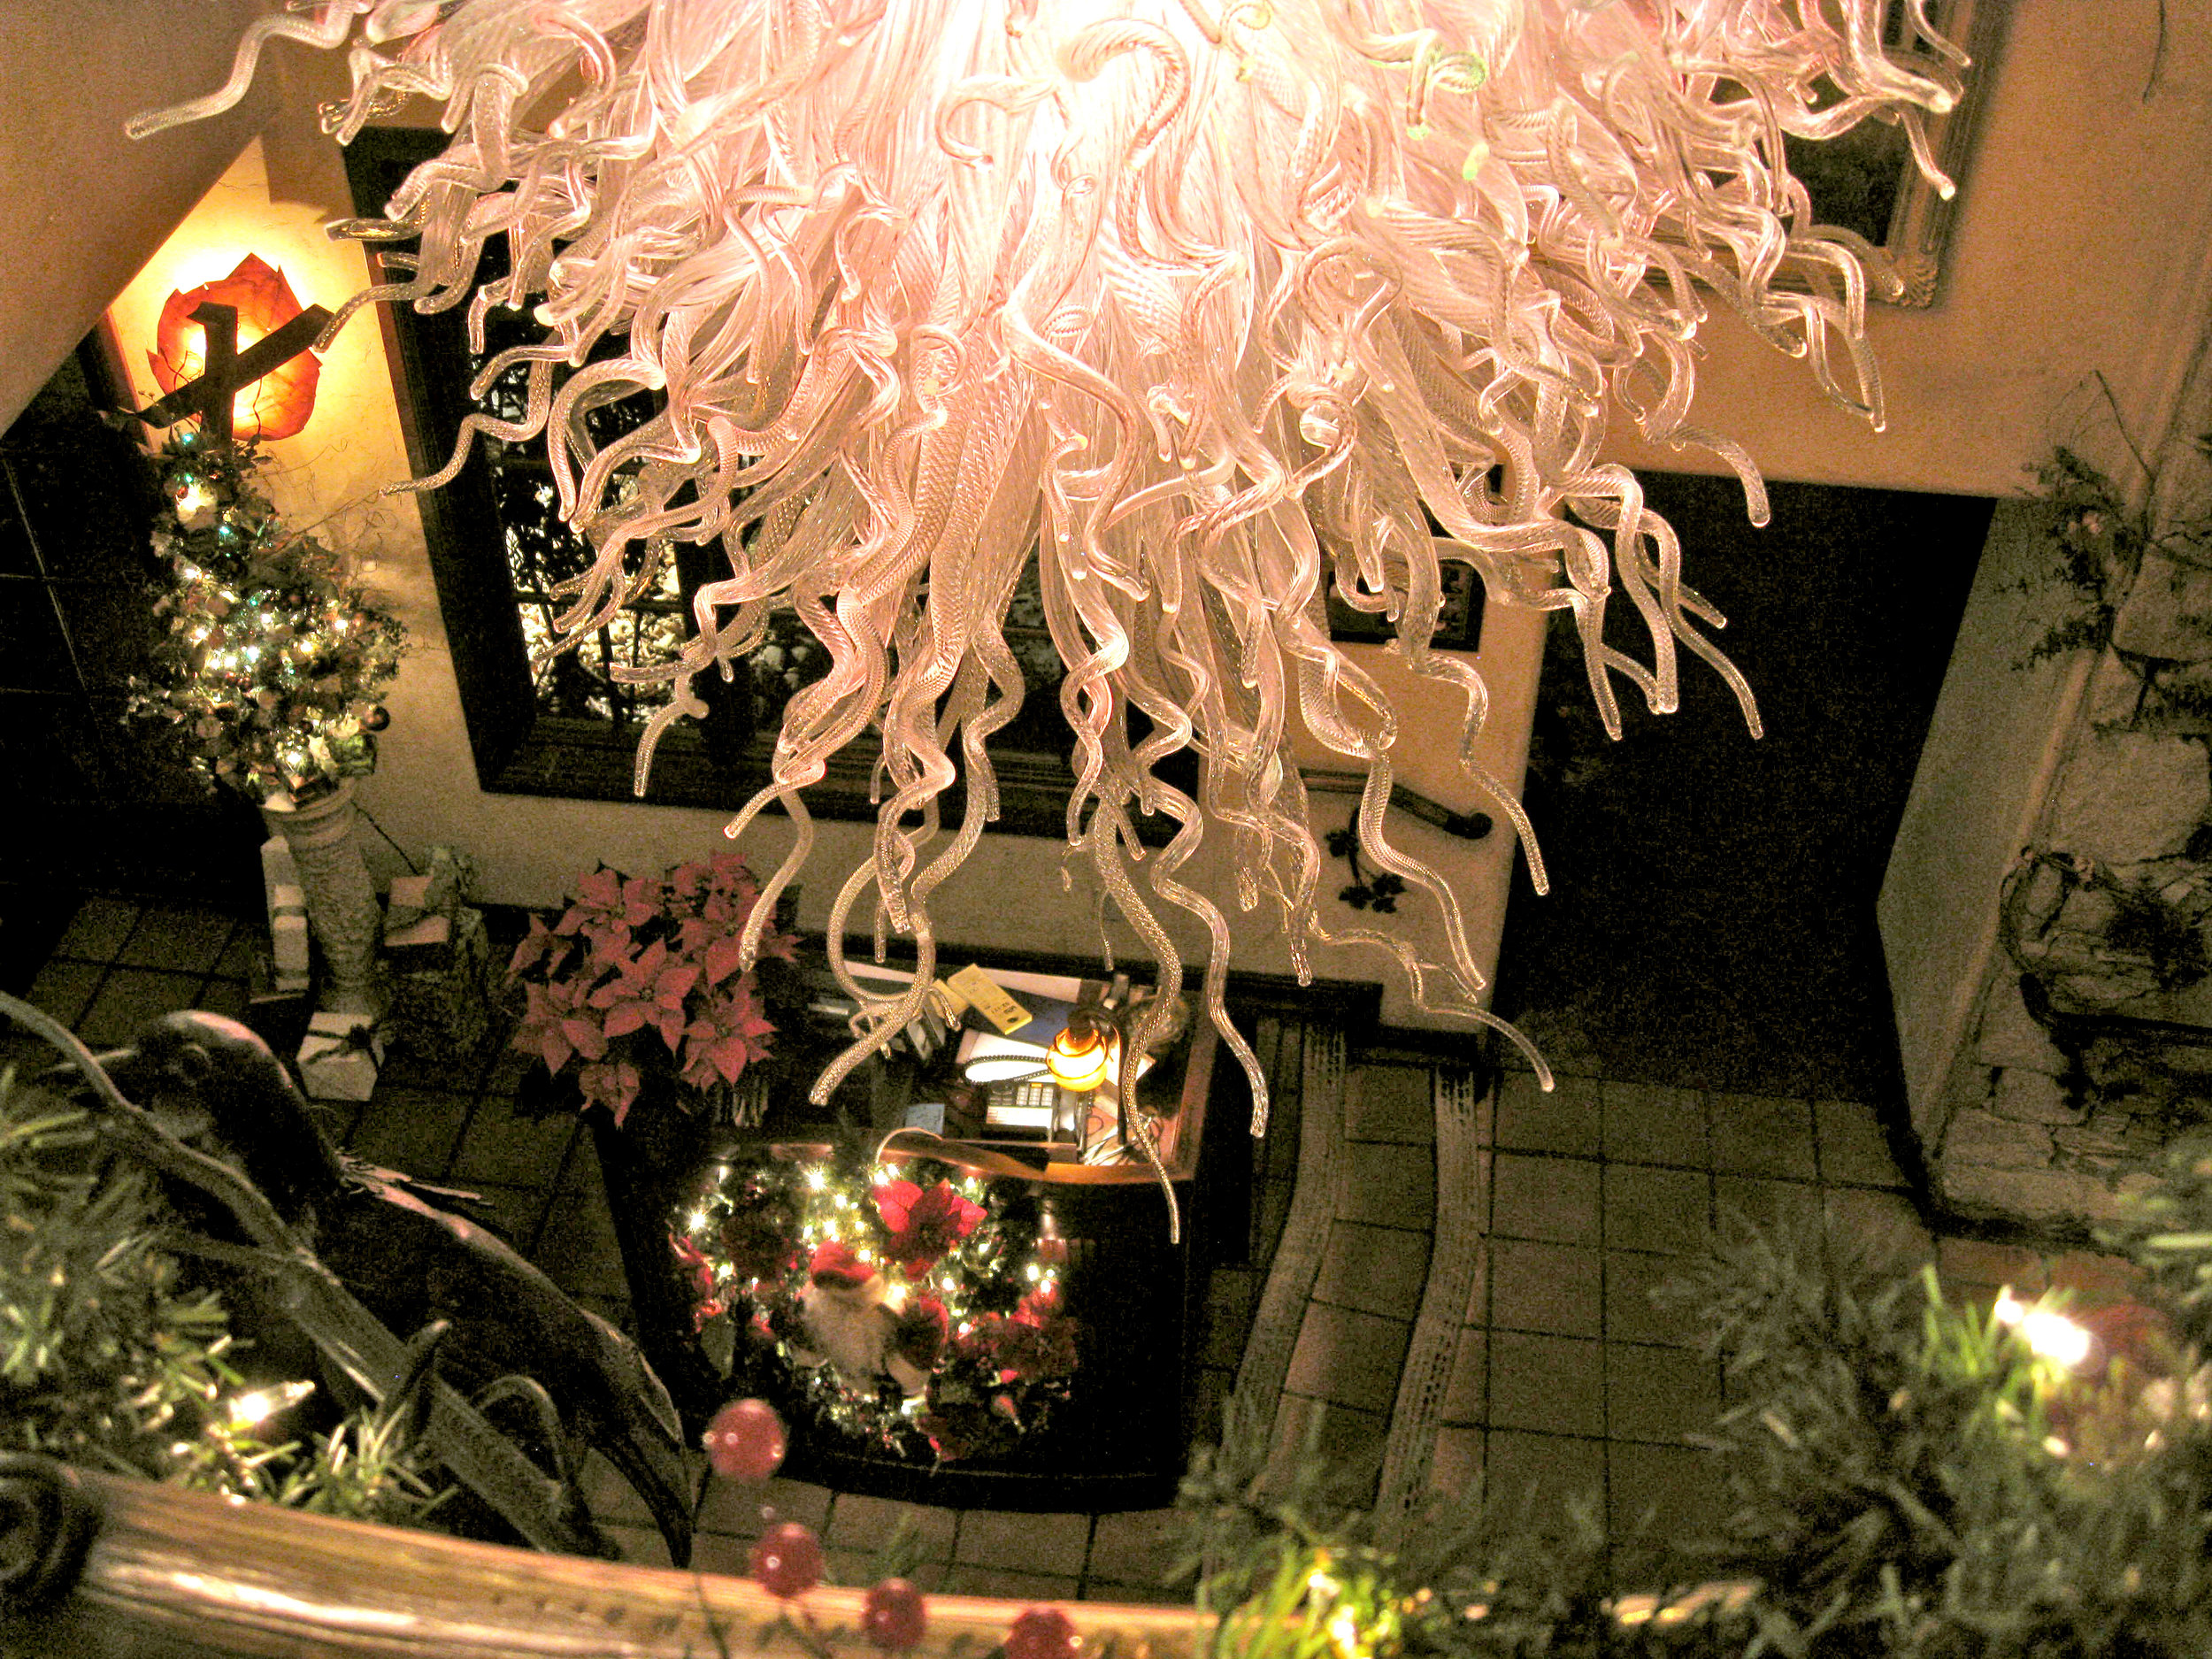 5 Holdman Studio Art and Hot Blown Glass Chandelier Gallery Tuscany Restaurant.jpg